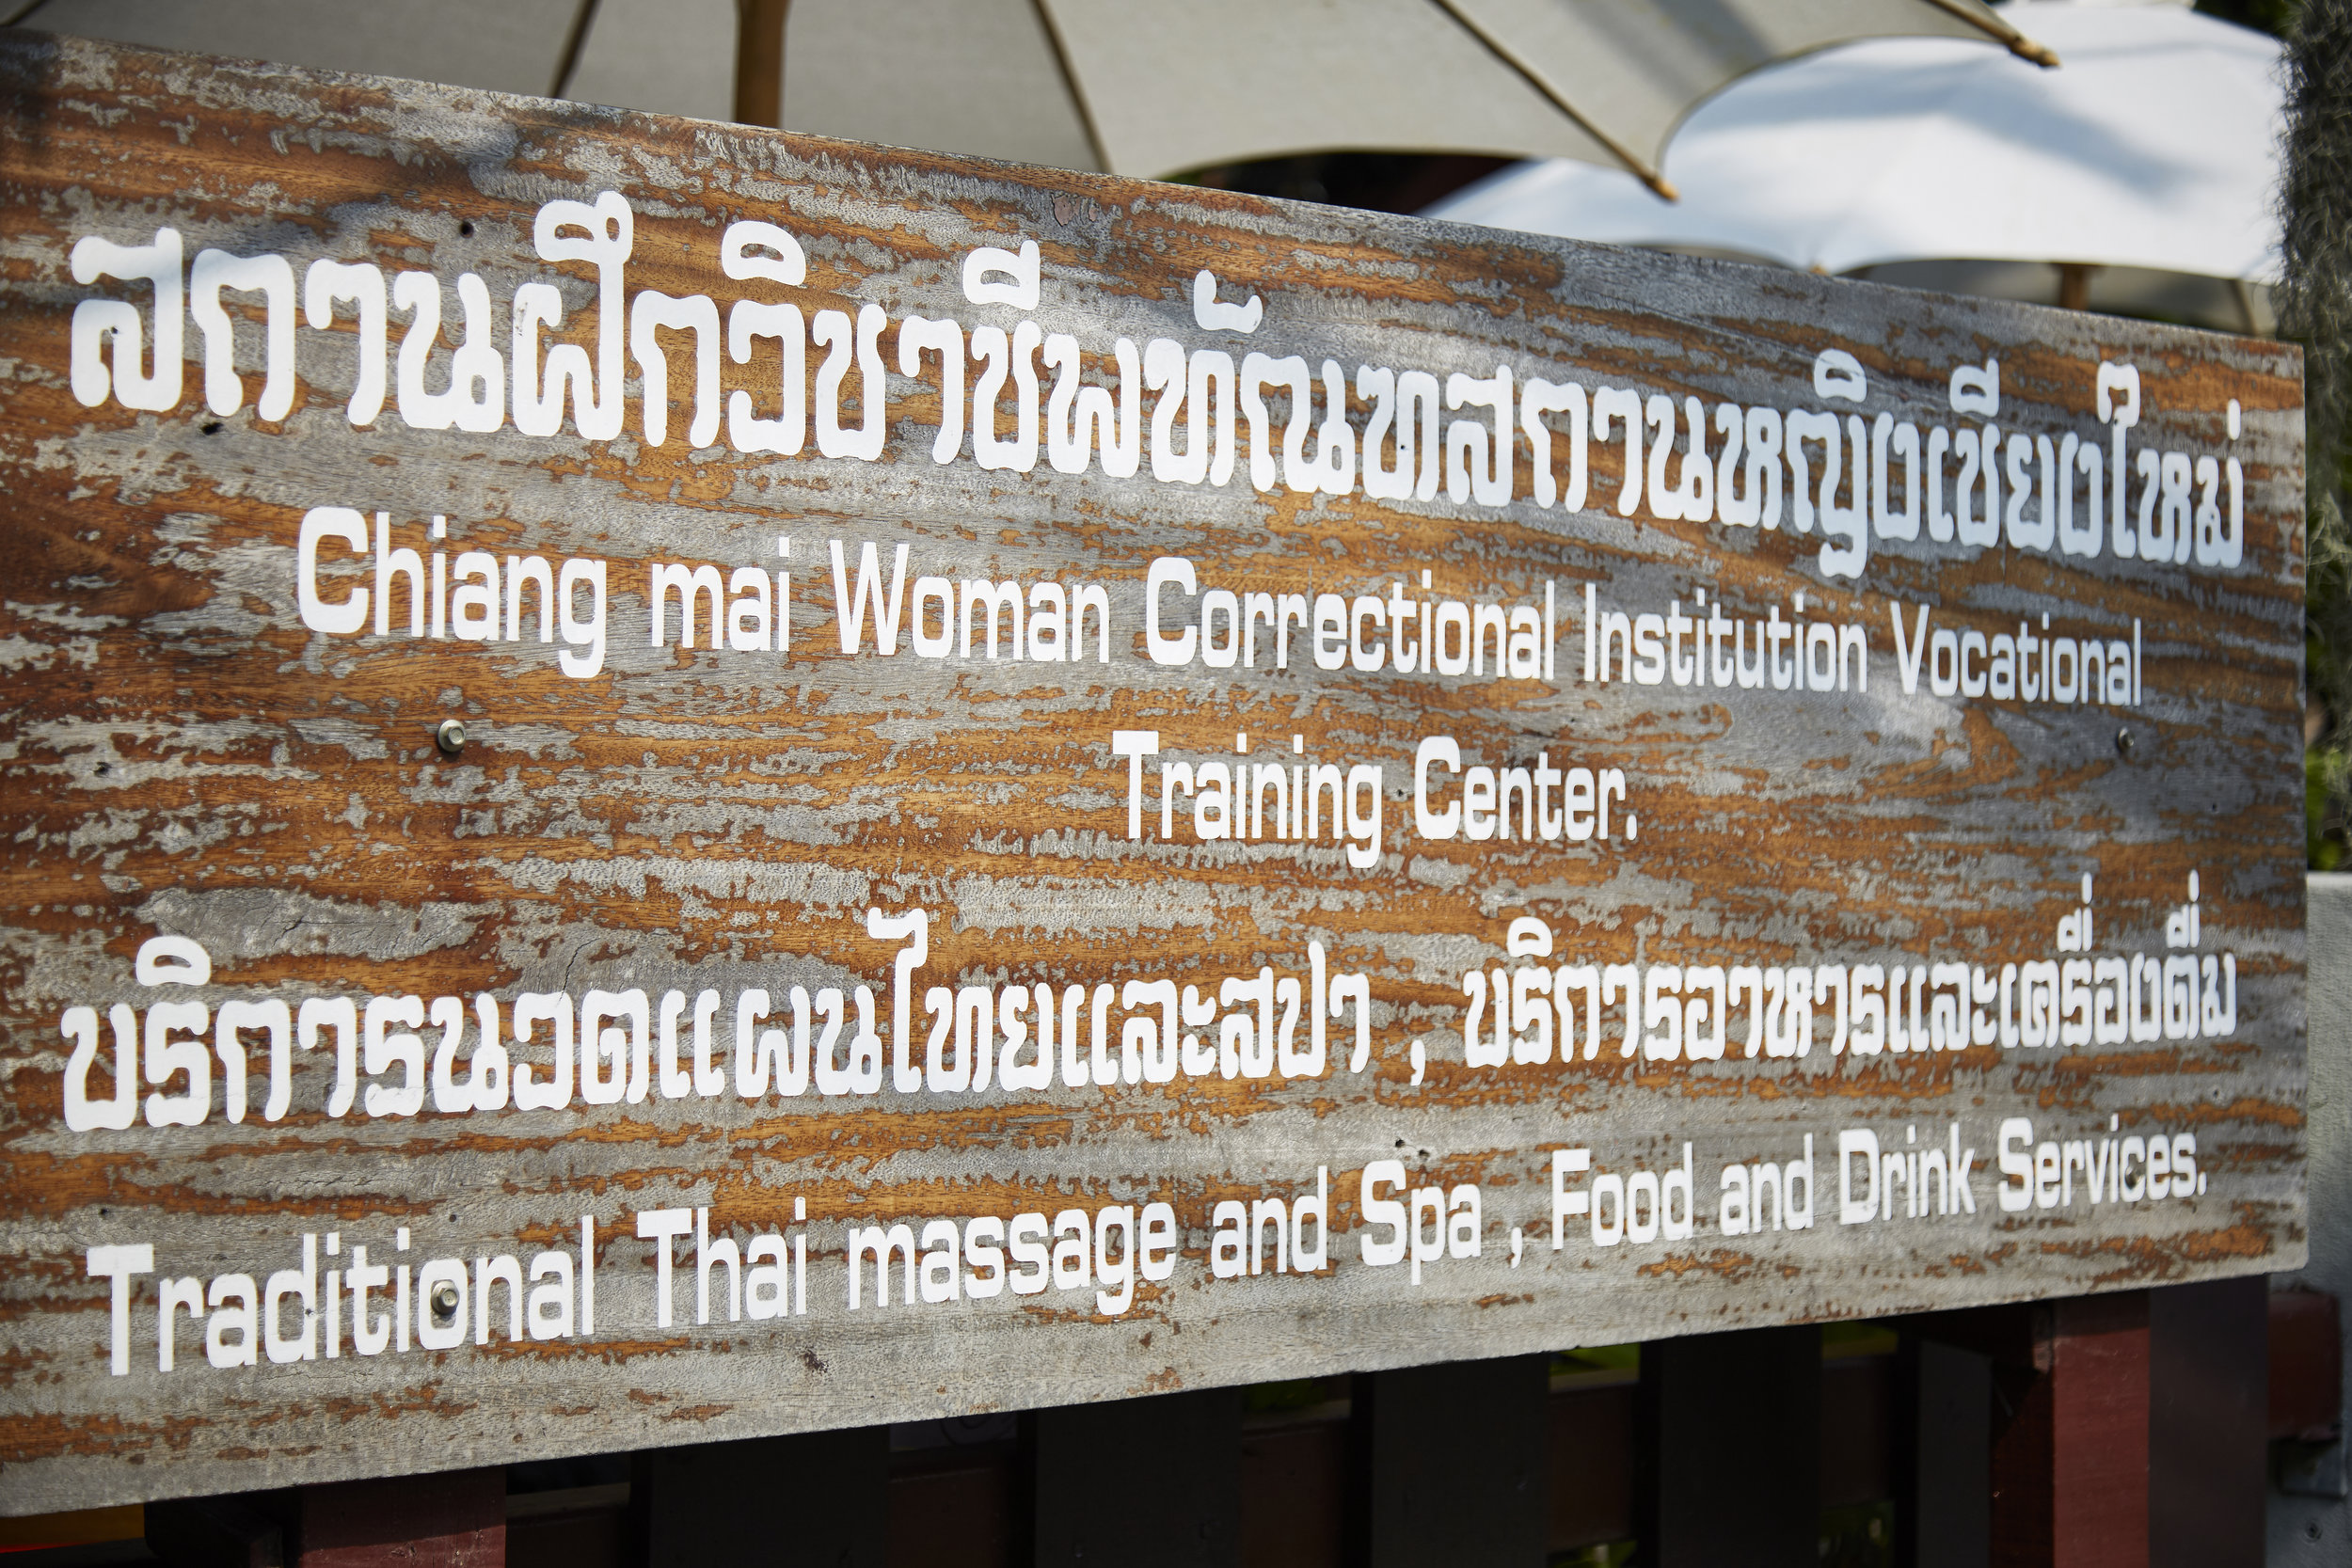 Chiang Mai's Correctional Institution and rehabilitation program for women prisoners